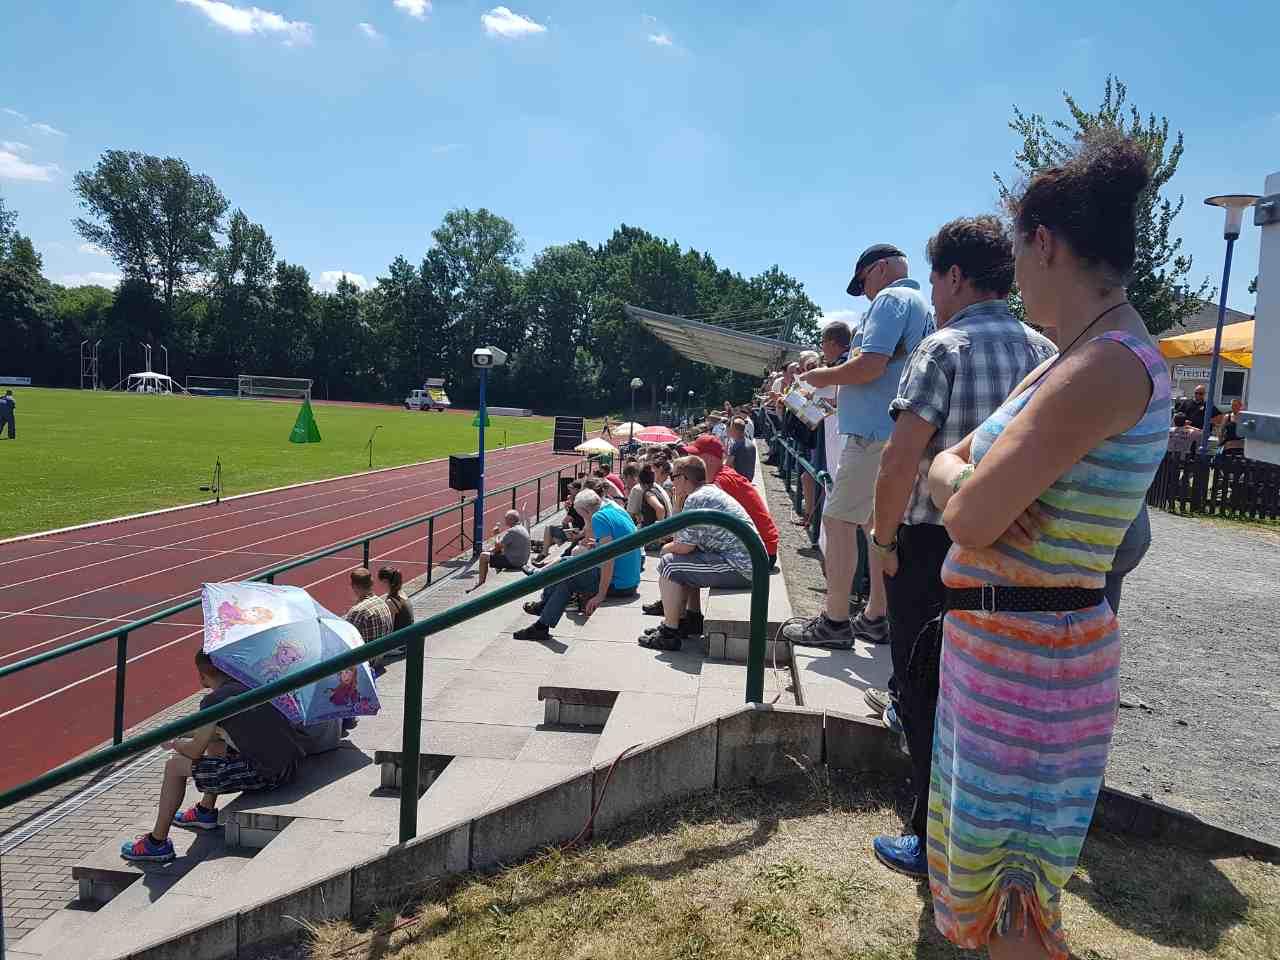 Bundesqualifikation FCI 24./25.Juni 2017 in Leipzig/Taucha